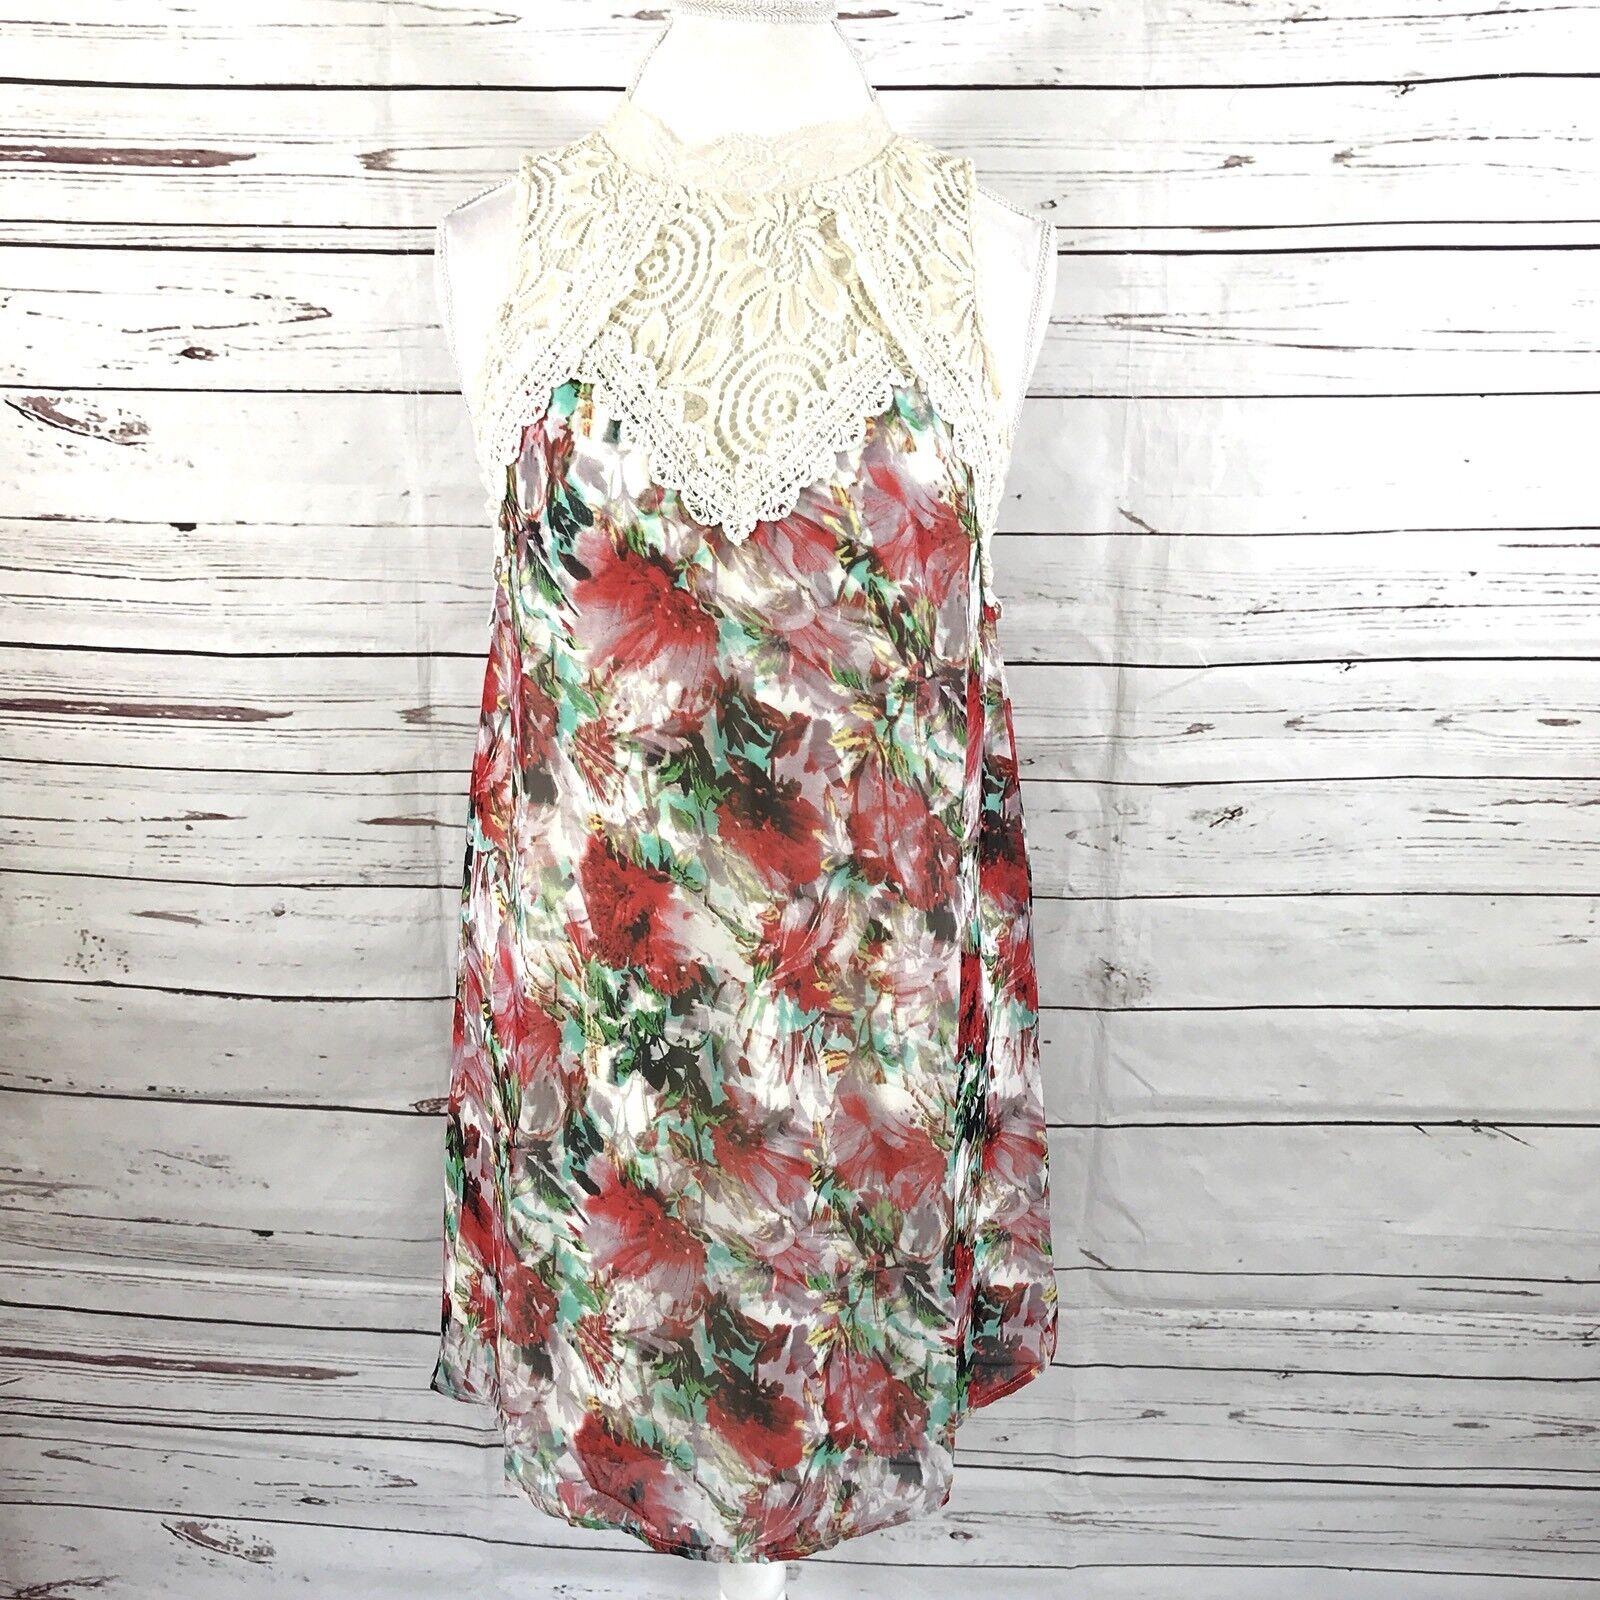 Anthropology Entro  Woherren Tunic Dress Lace Floral Größe M NWT